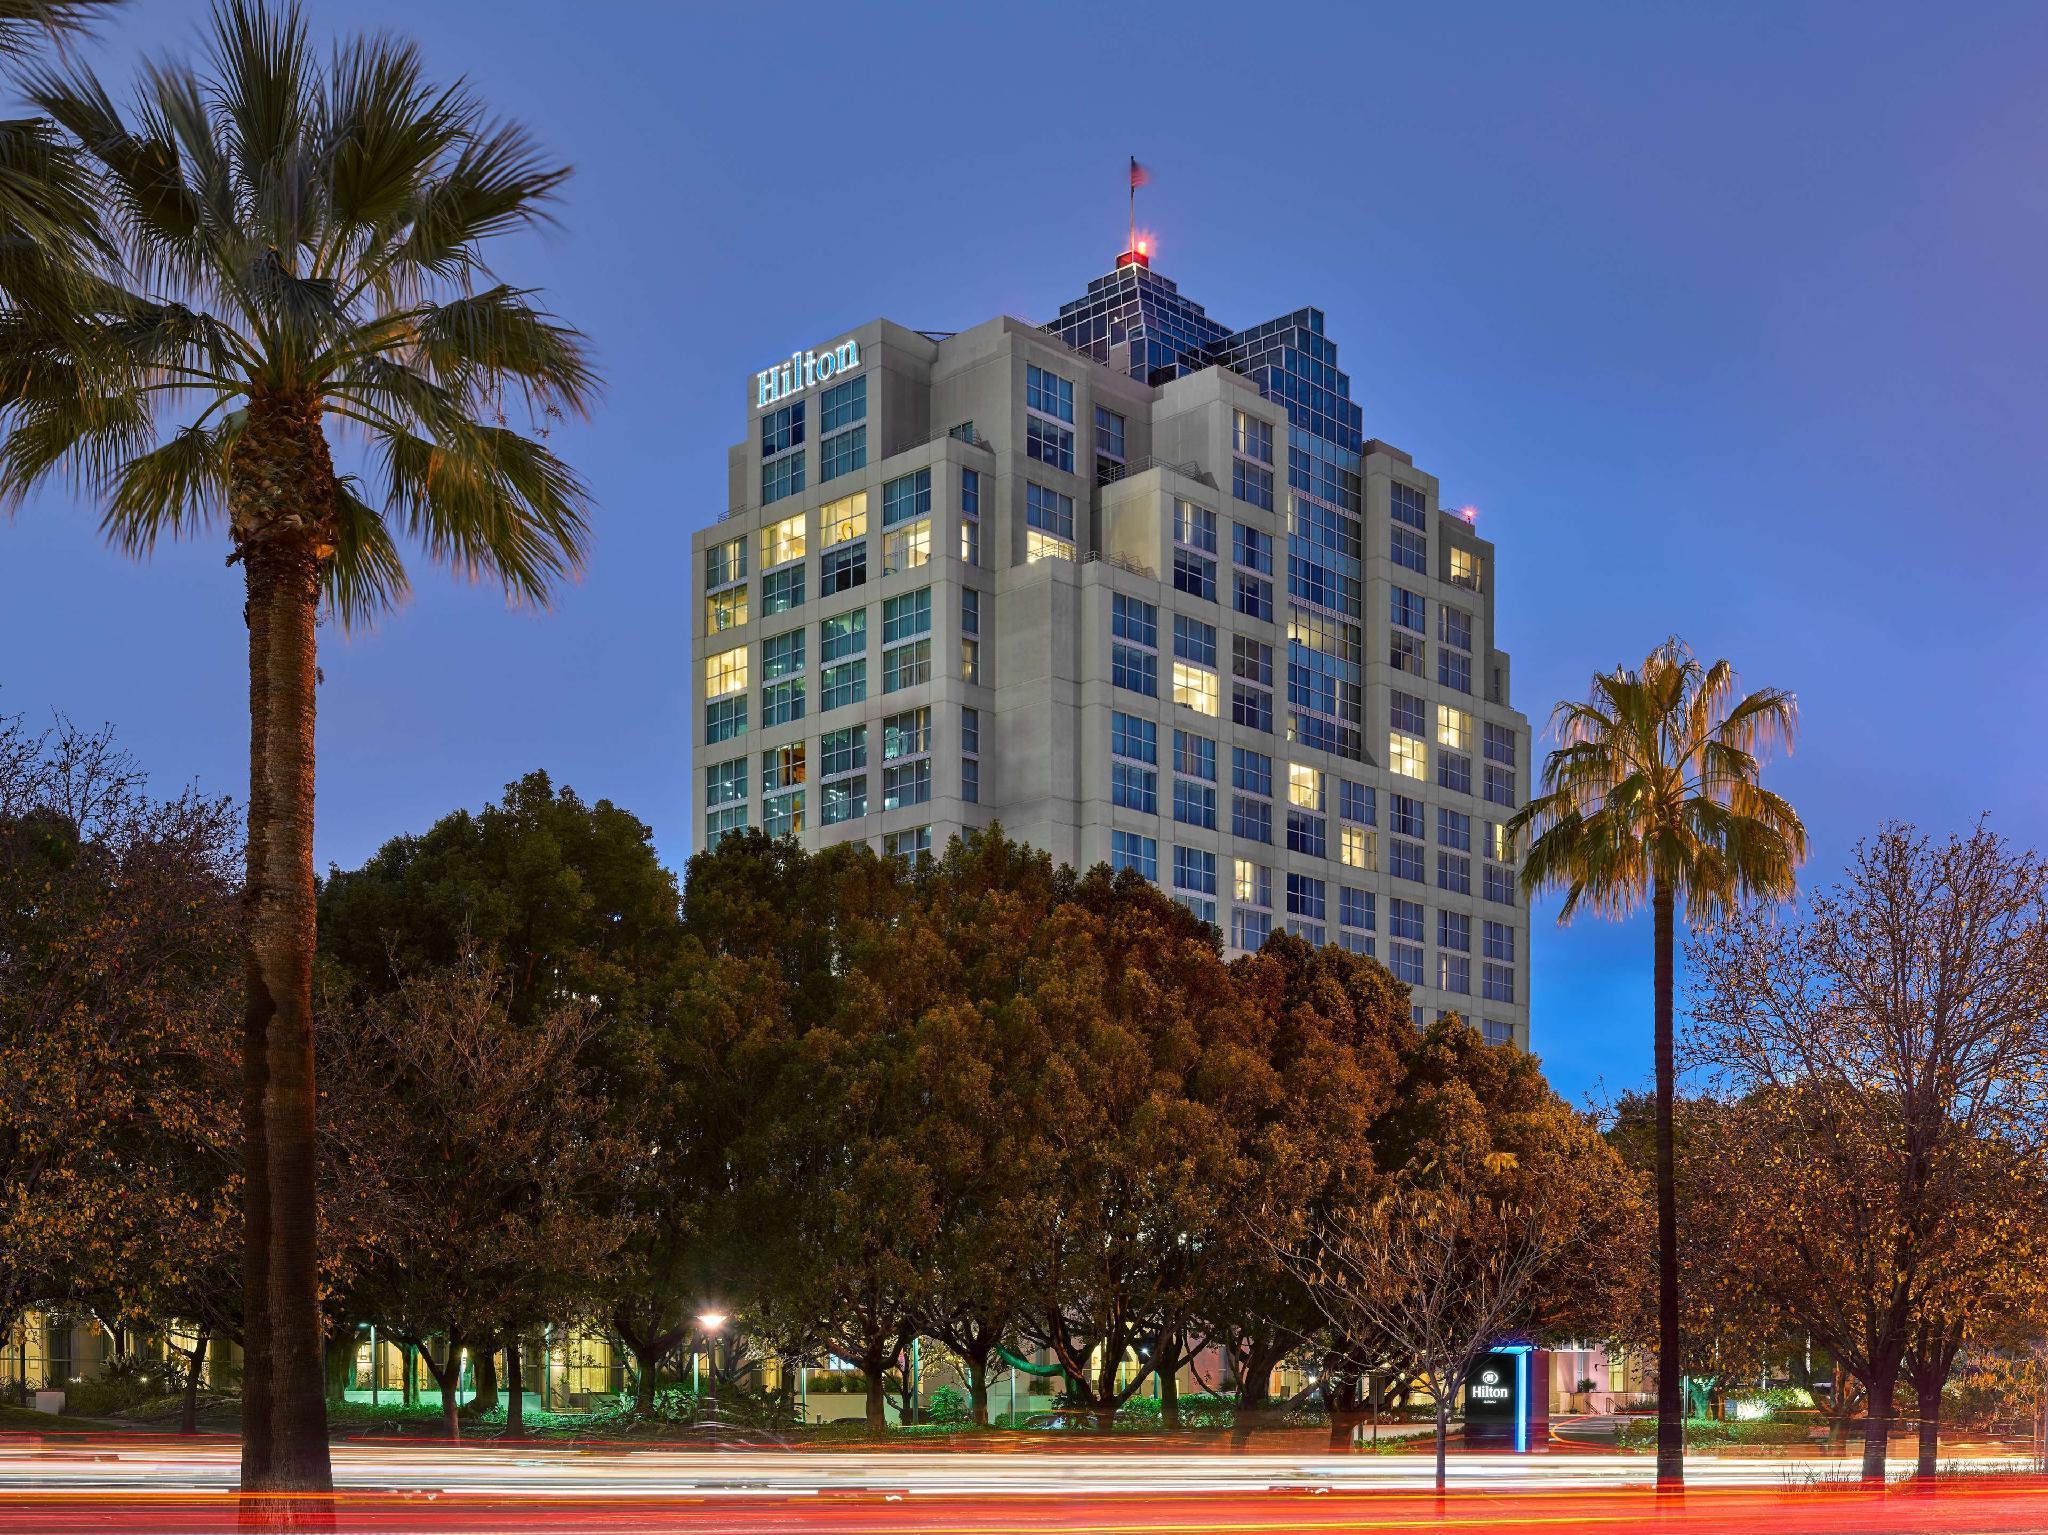 Hilton Glendale Hotel